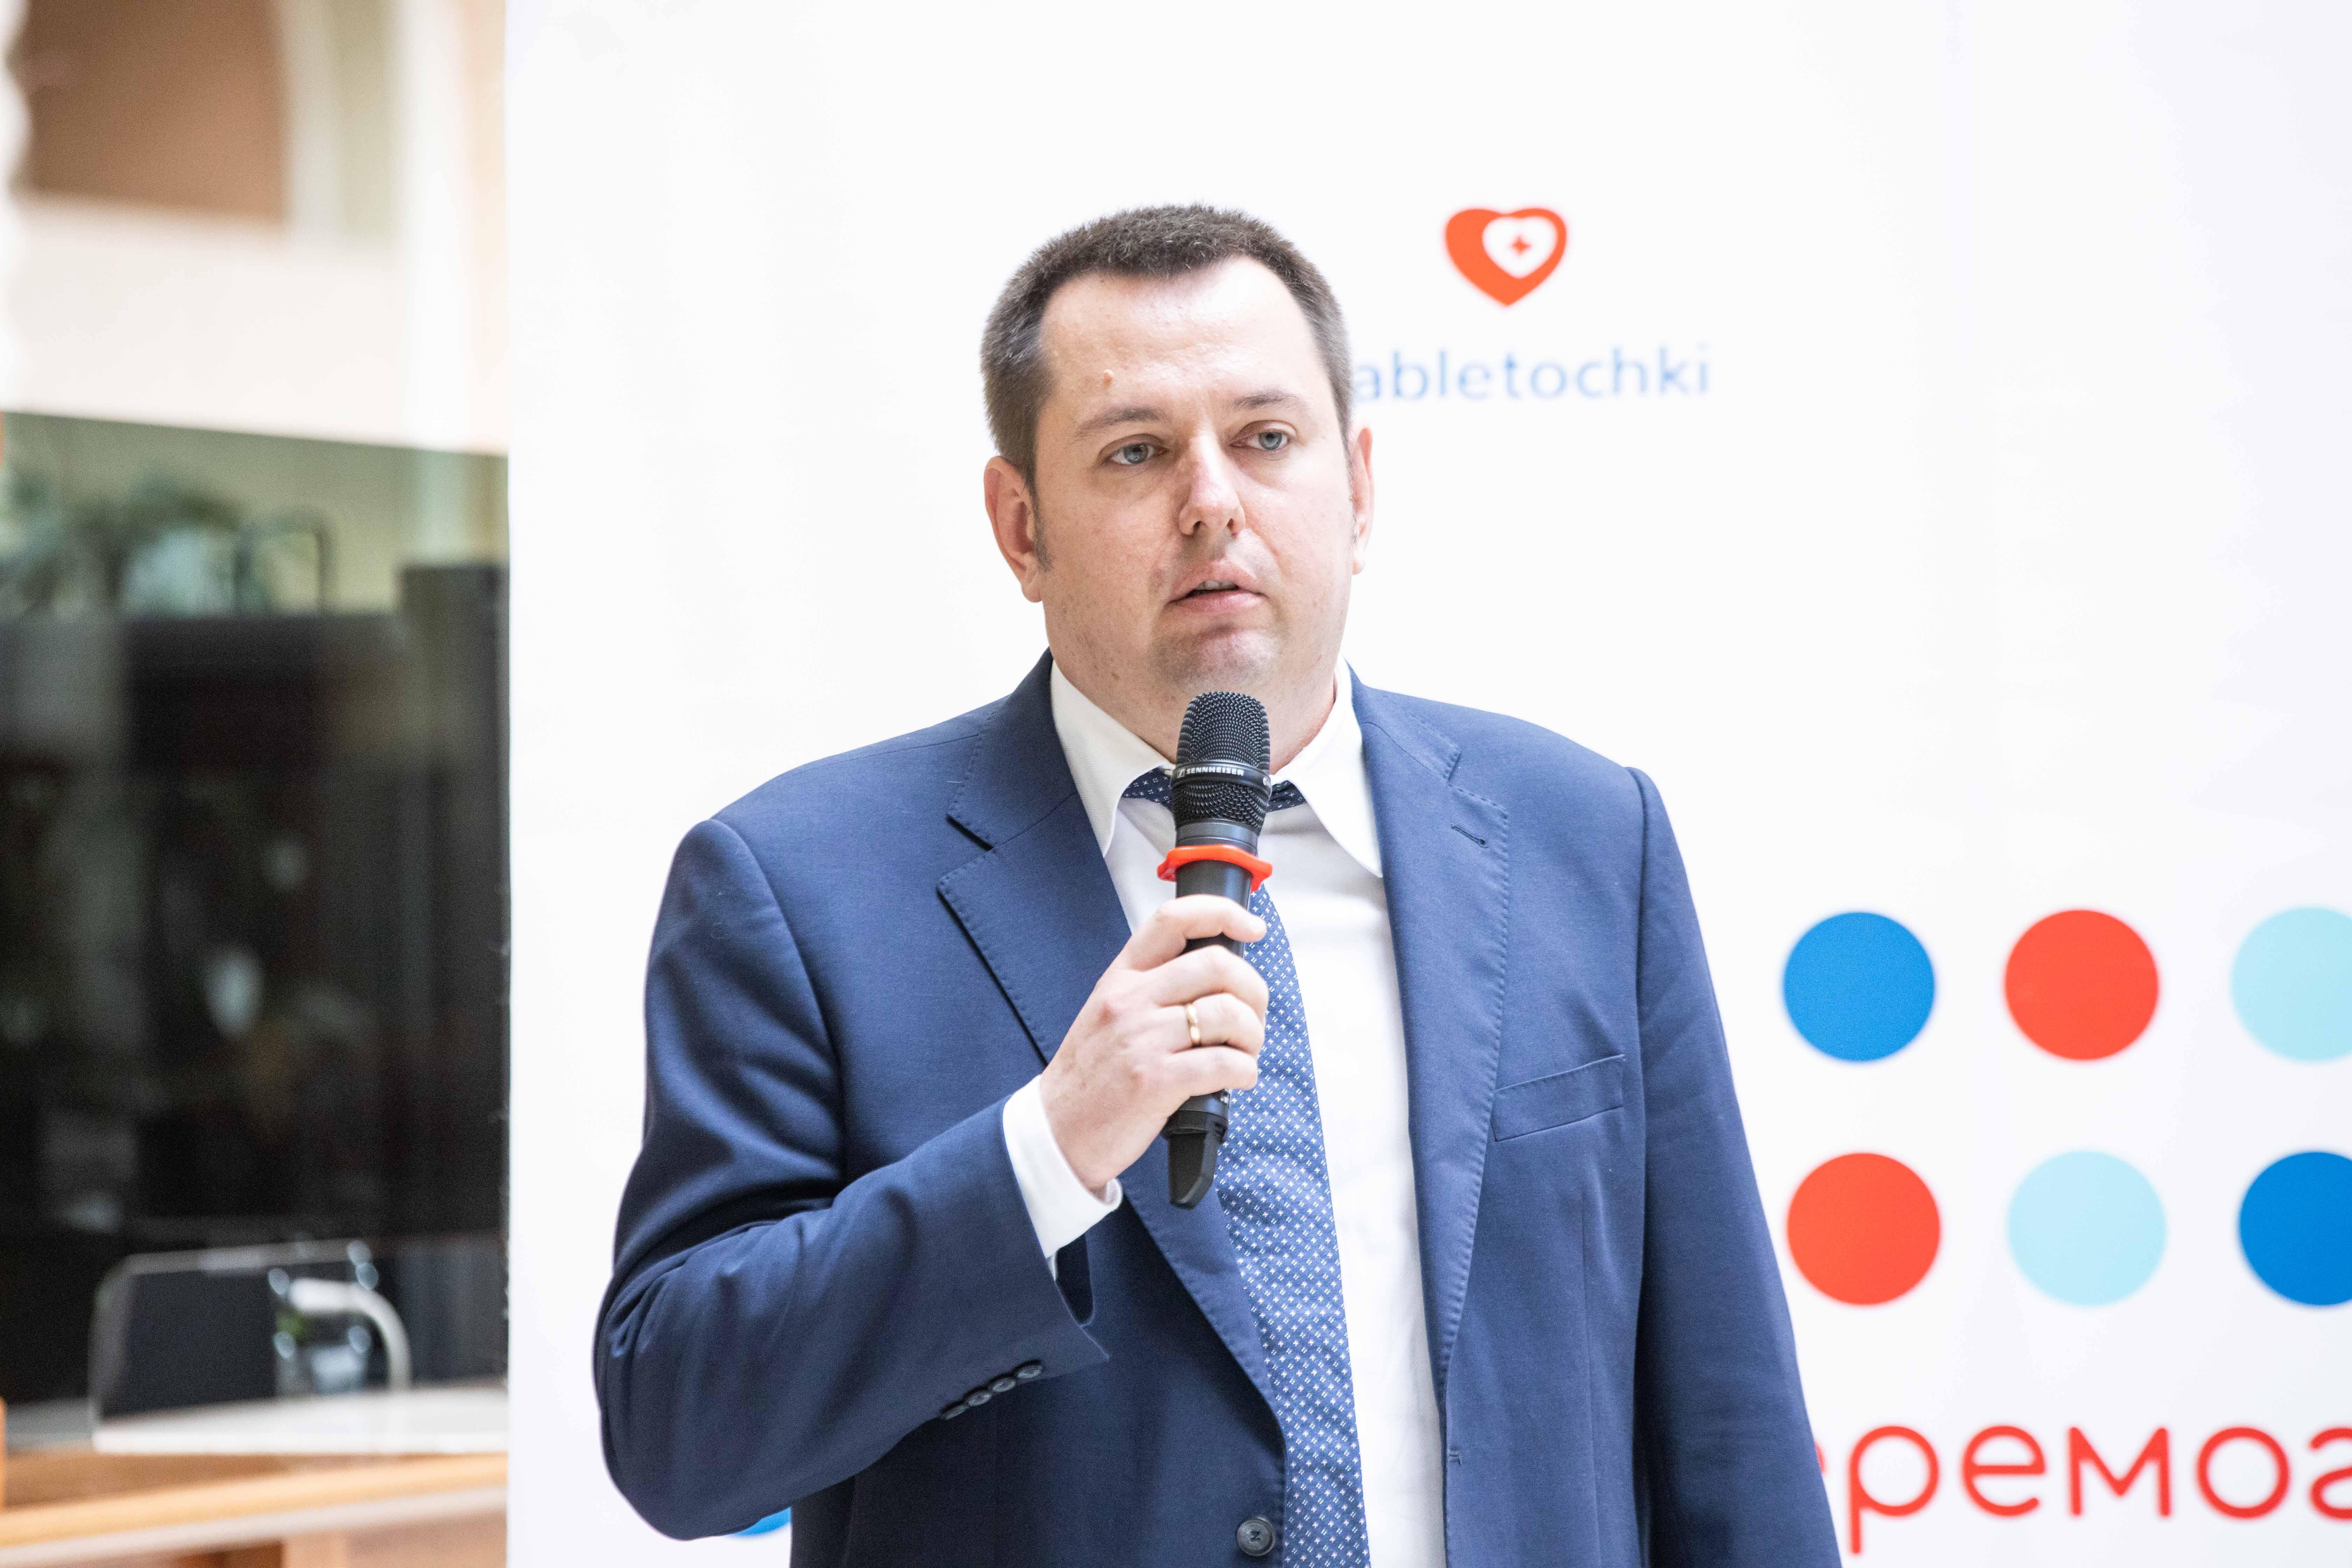 МТБ БАНК присоединился к акции «Монетки детям» - фото 2 - mtb.ua